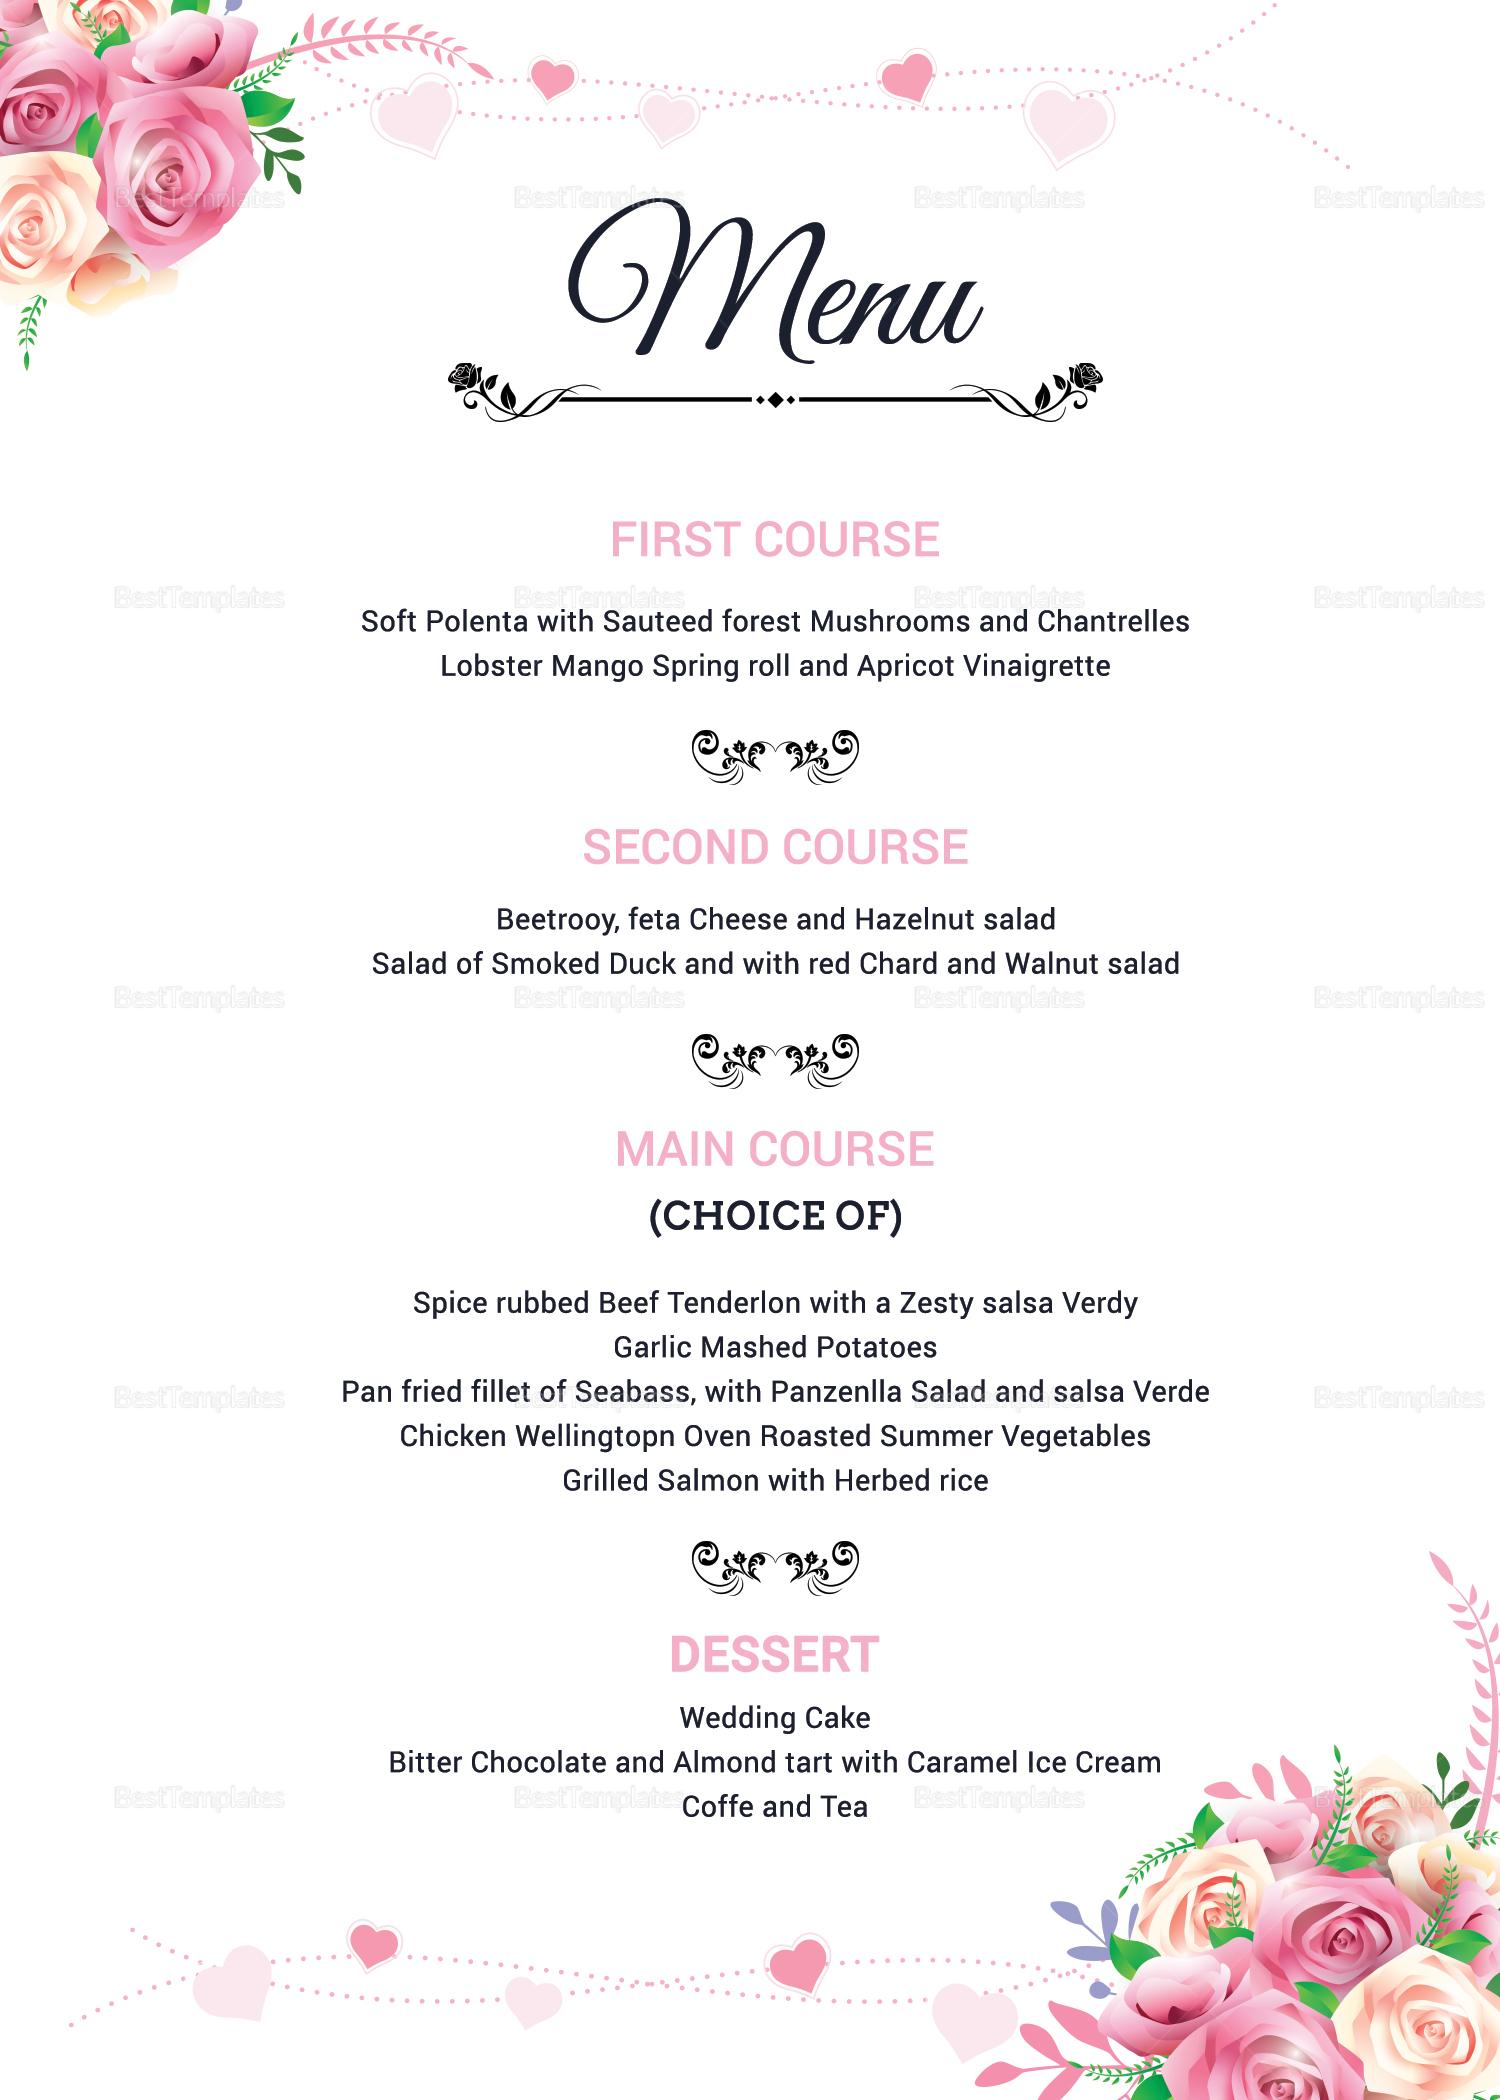 Floral Wedding Menu Invitation Design Template In Word